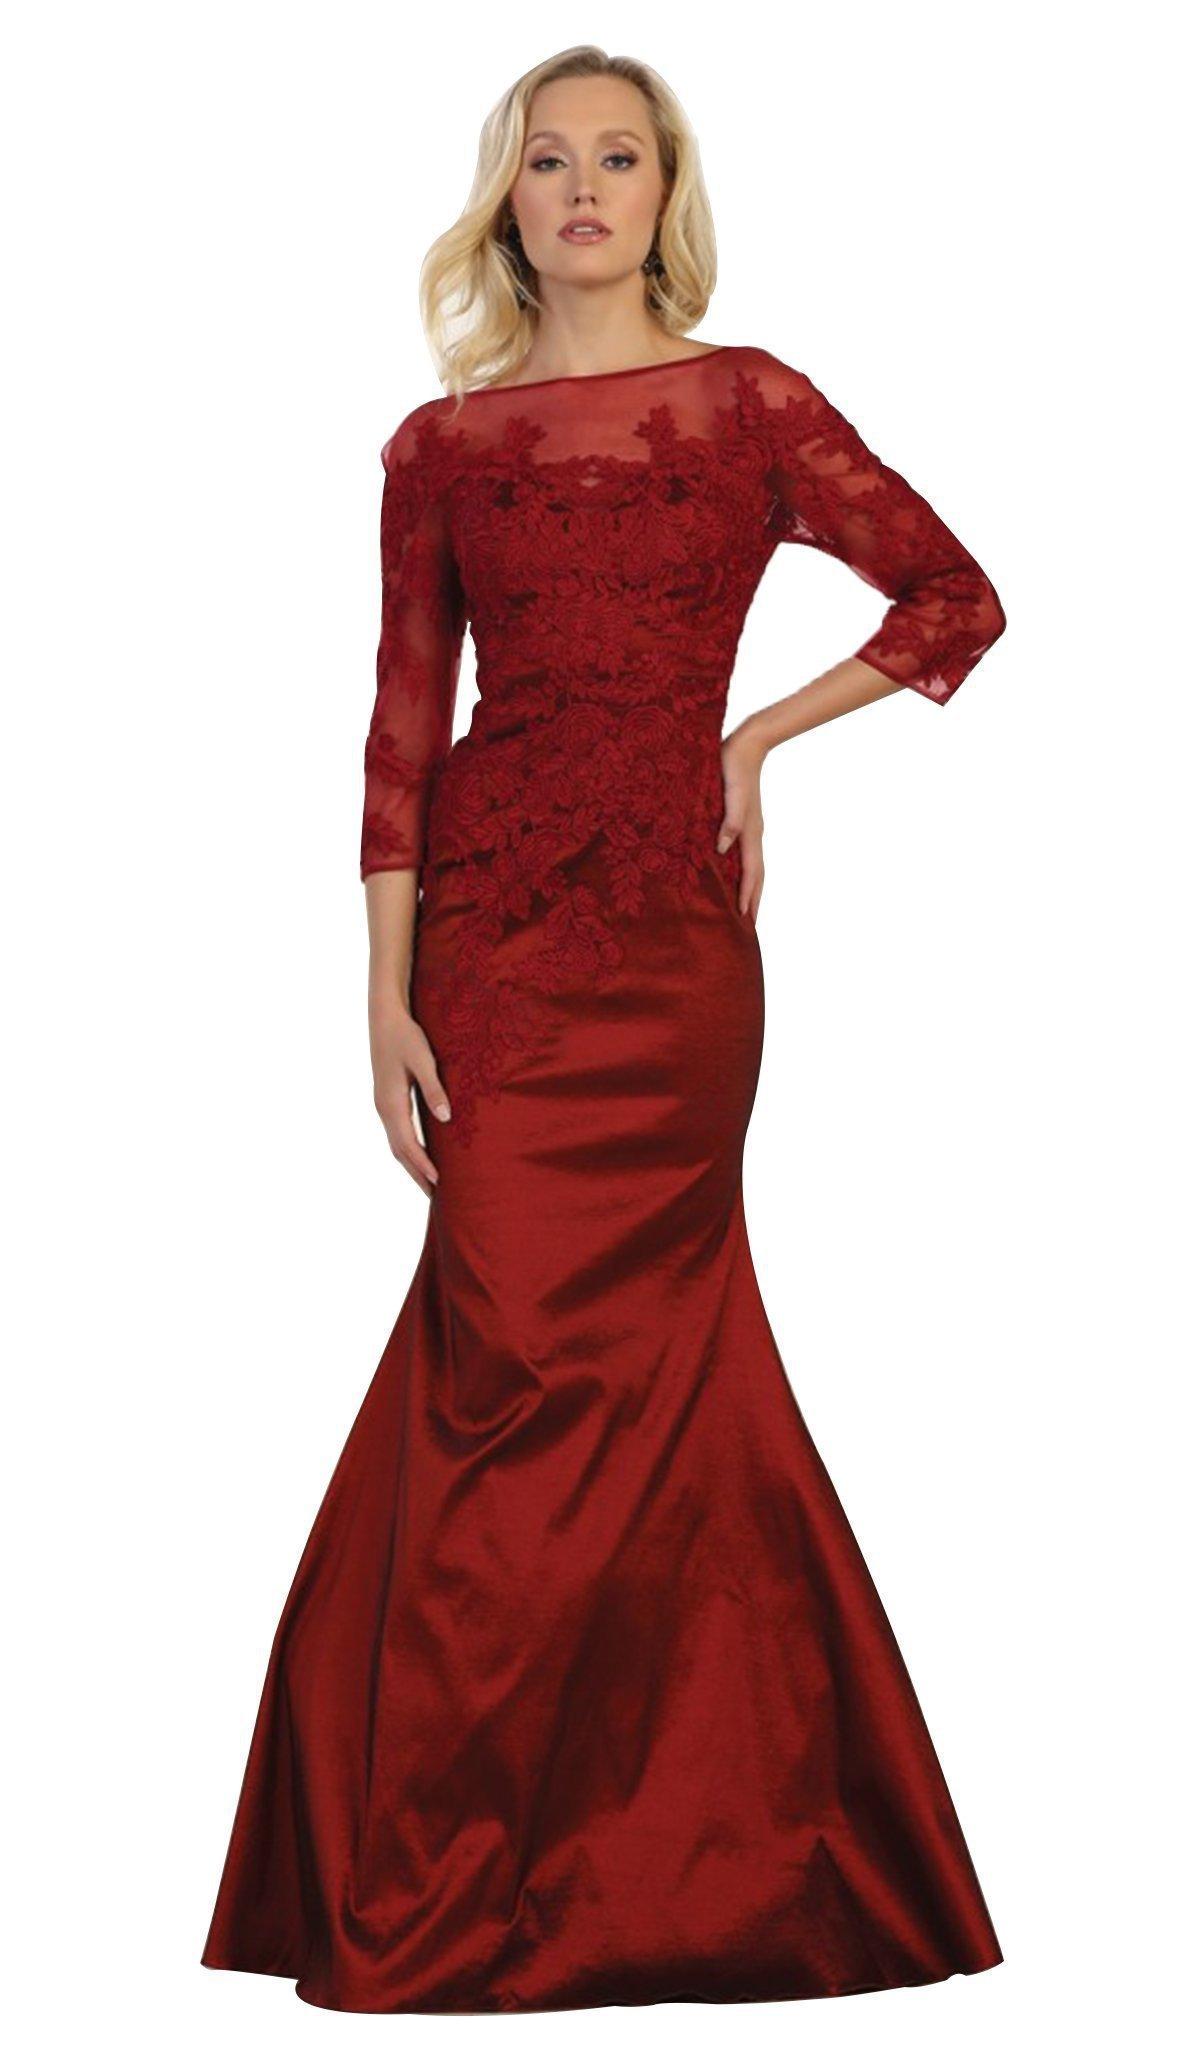 May Queen - MQ1501 Beaded Illusion Bateau Trumpet Evening Dress